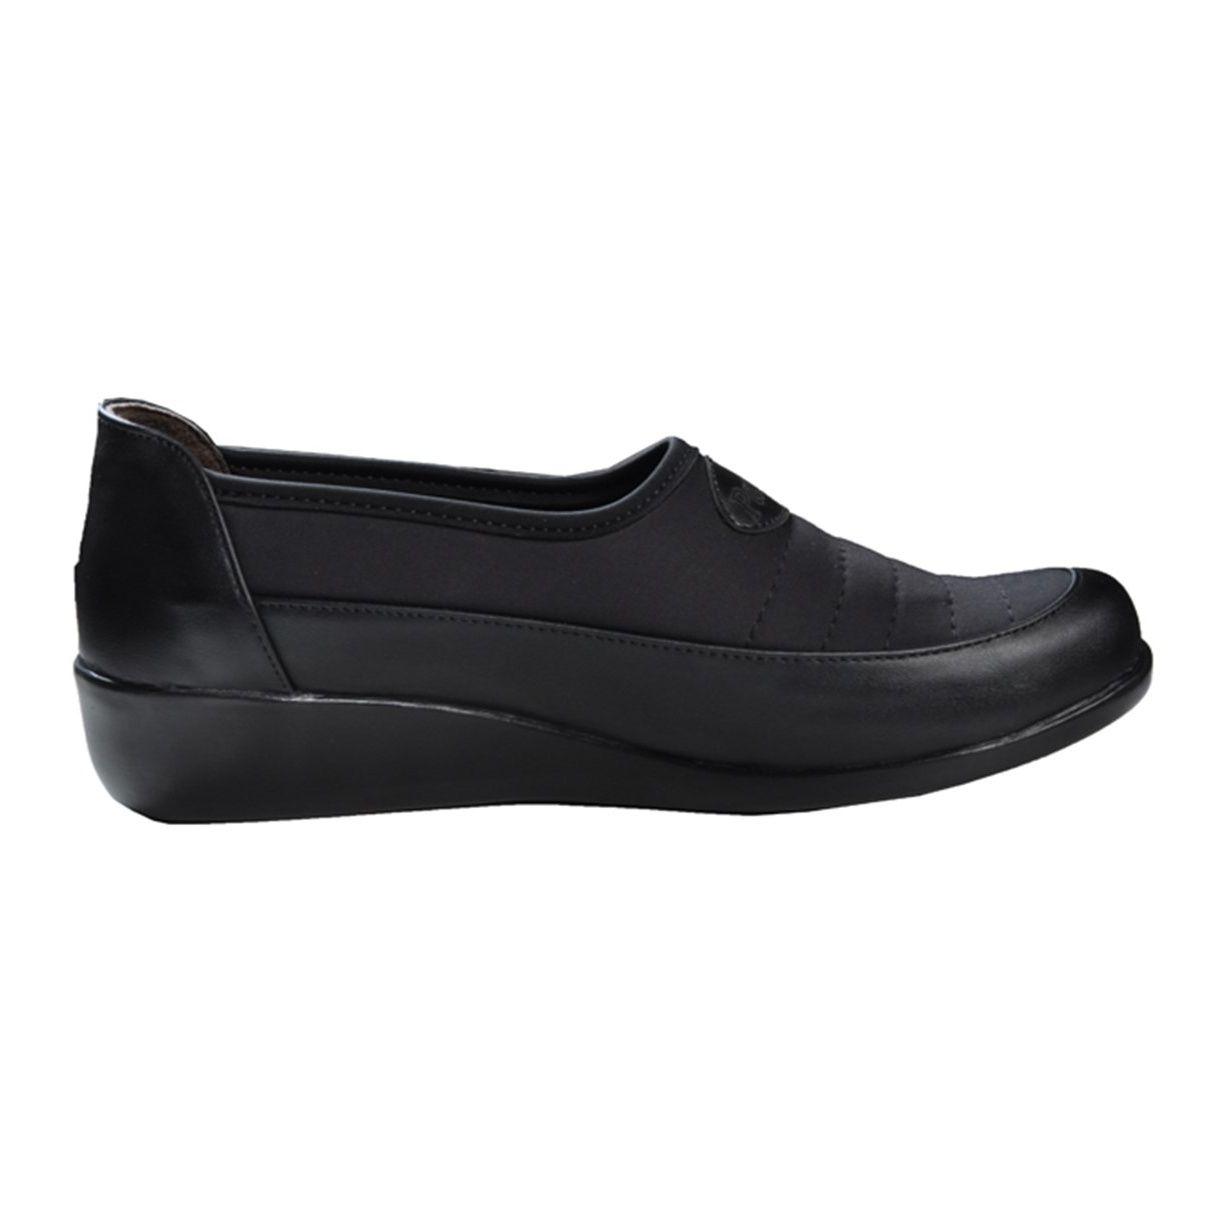 کفش روزمره زنانه مدل ARZ531M main 1 1